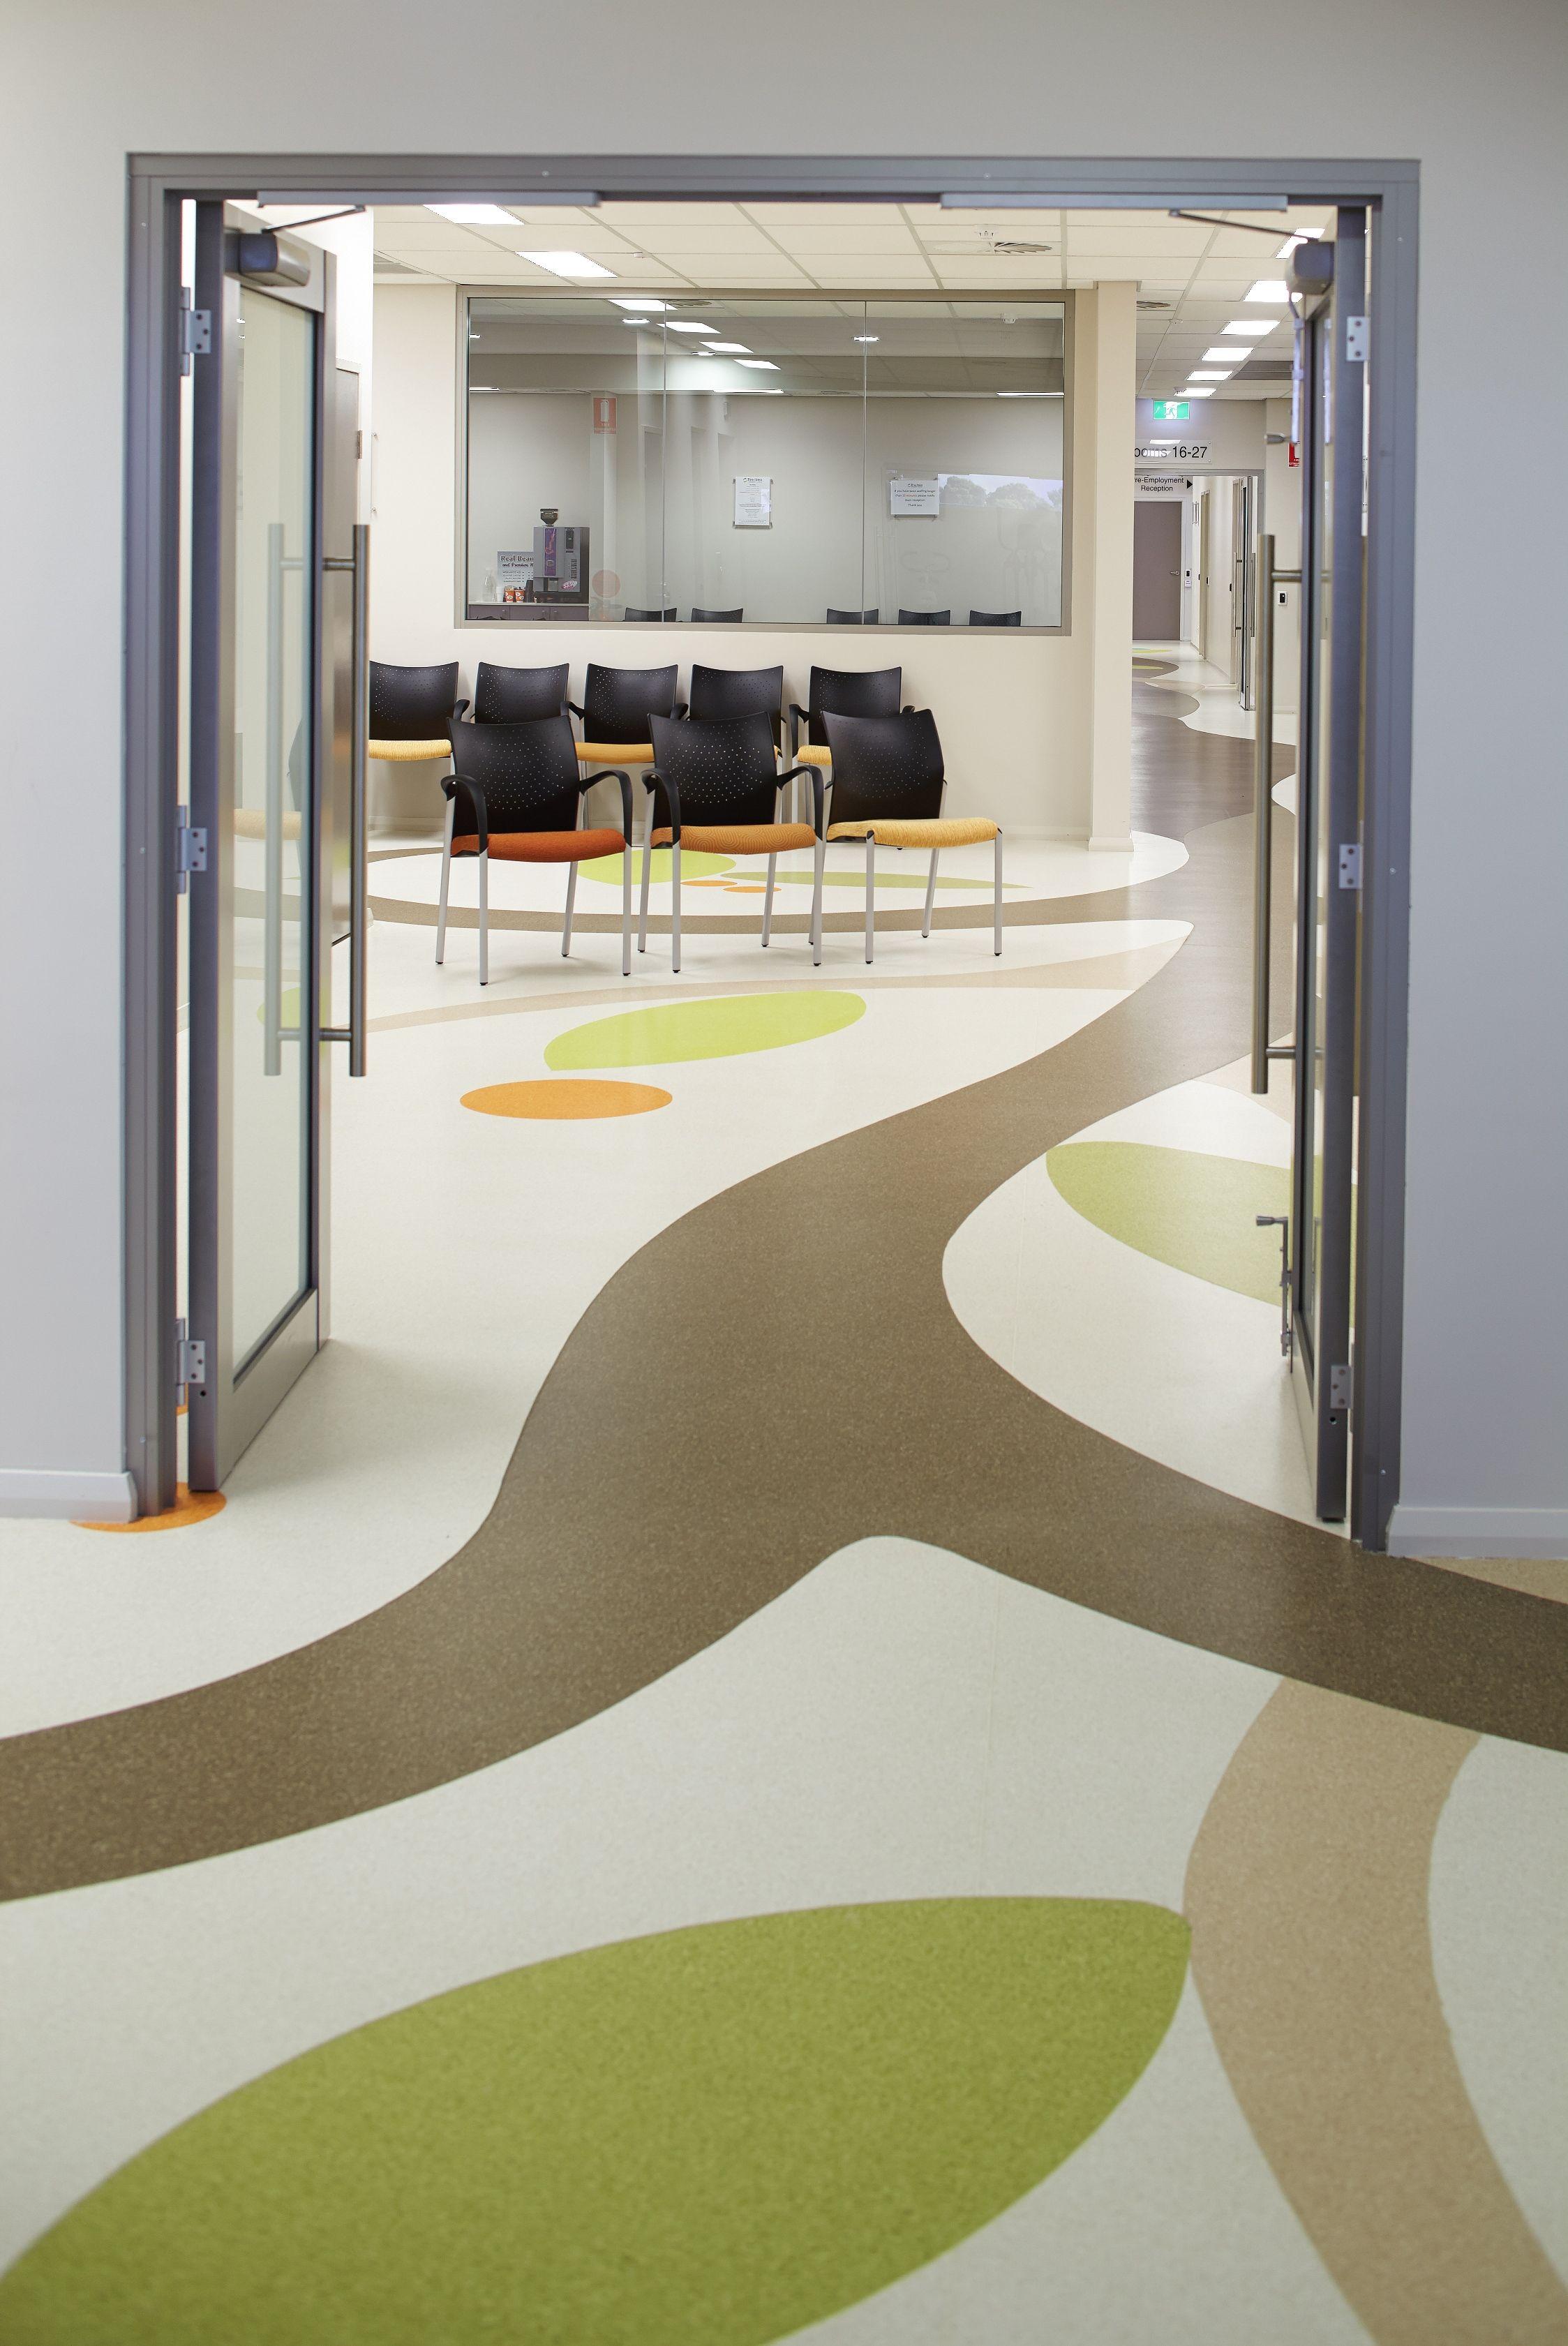 Bunbury Medical Centre gerlor flooring design